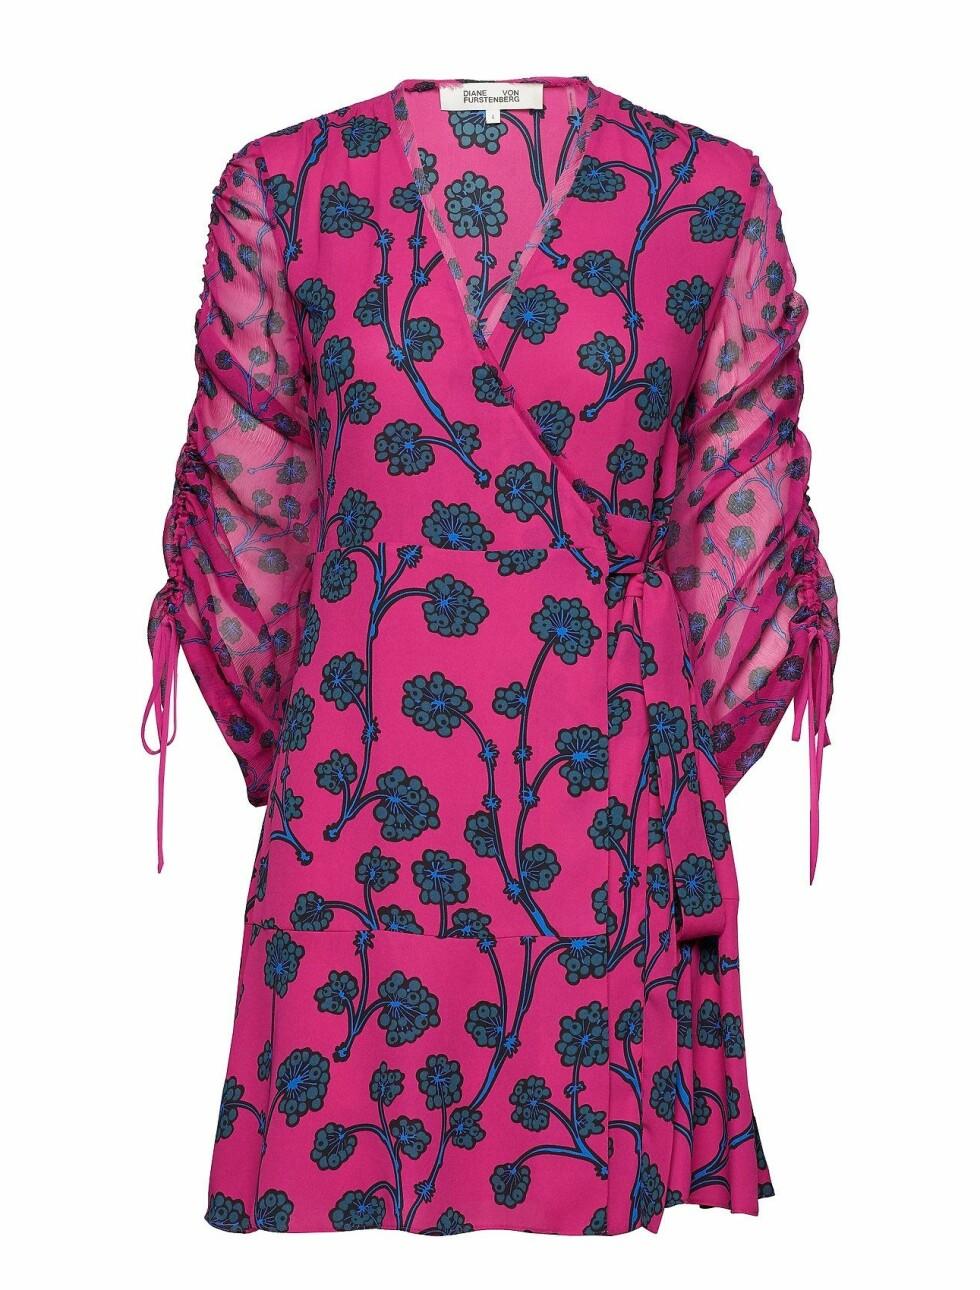 Kjole fra Diane von Furstenberg |4899,-| https://www.boozt.com/no/no/diane-von-furstenberg/dvf-tamra_19554962/19554964?path=67362&navId=67362&sNavId=67453&group=listing&position=1000000